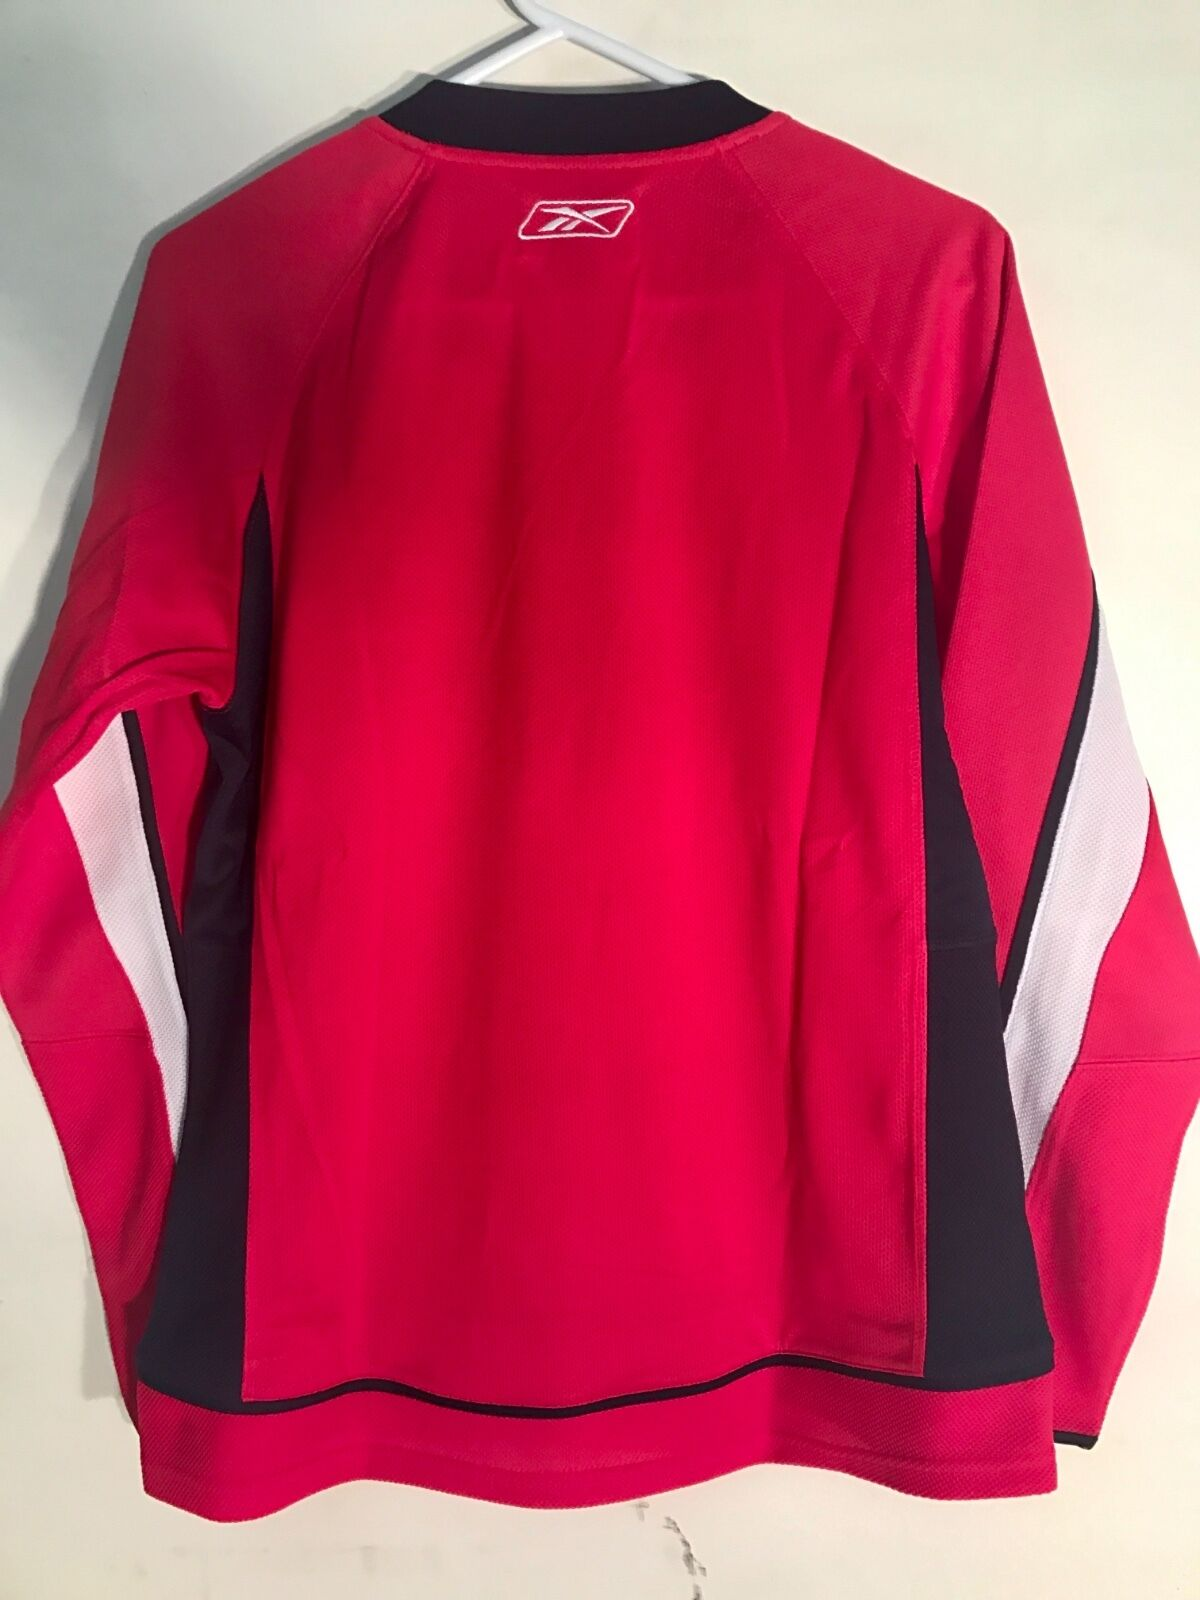 58b2794322b Washington Capitals Women s NHL Reebok Red Premier Jersey- L for sale  online